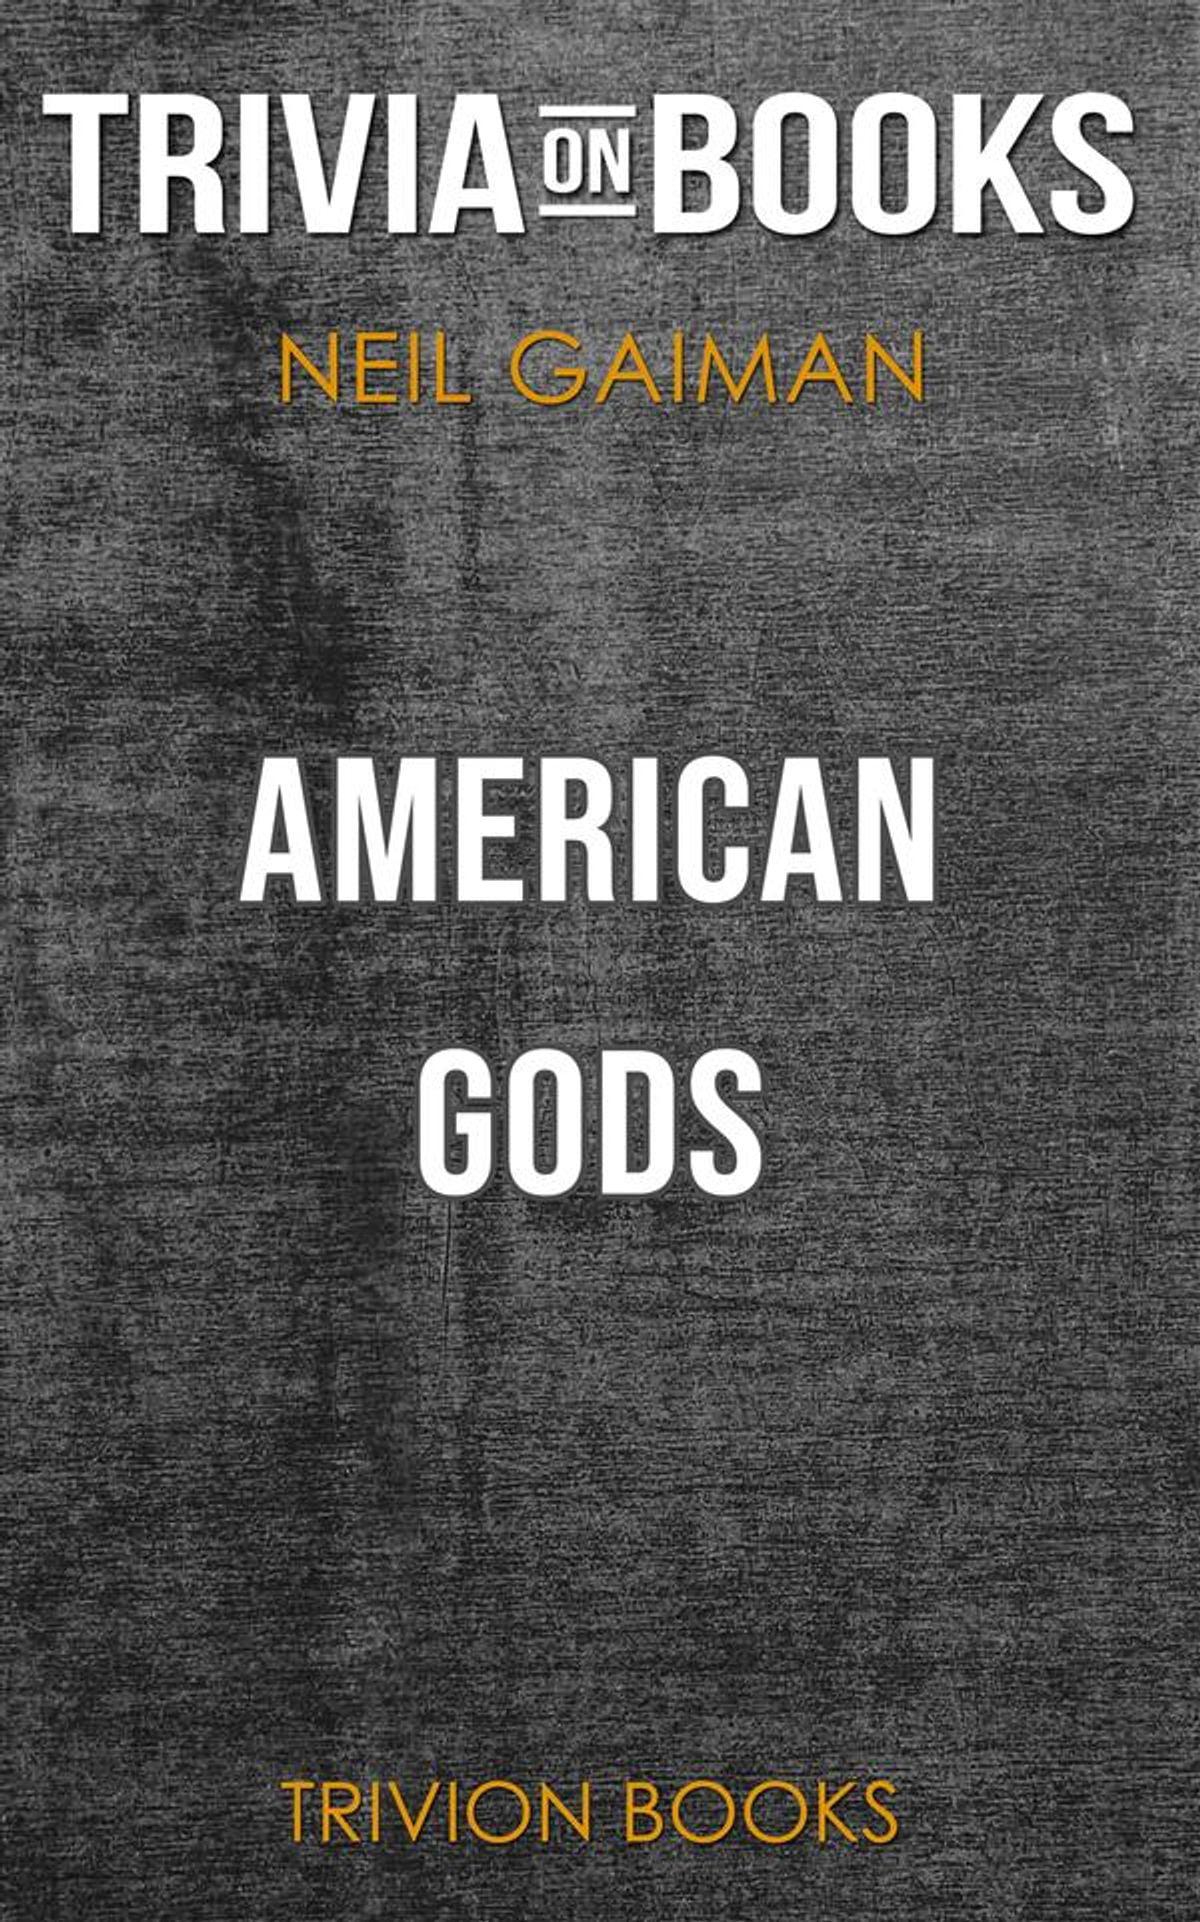 American Gods by Neil Gaiman (Trivia-On-Books) - eBook